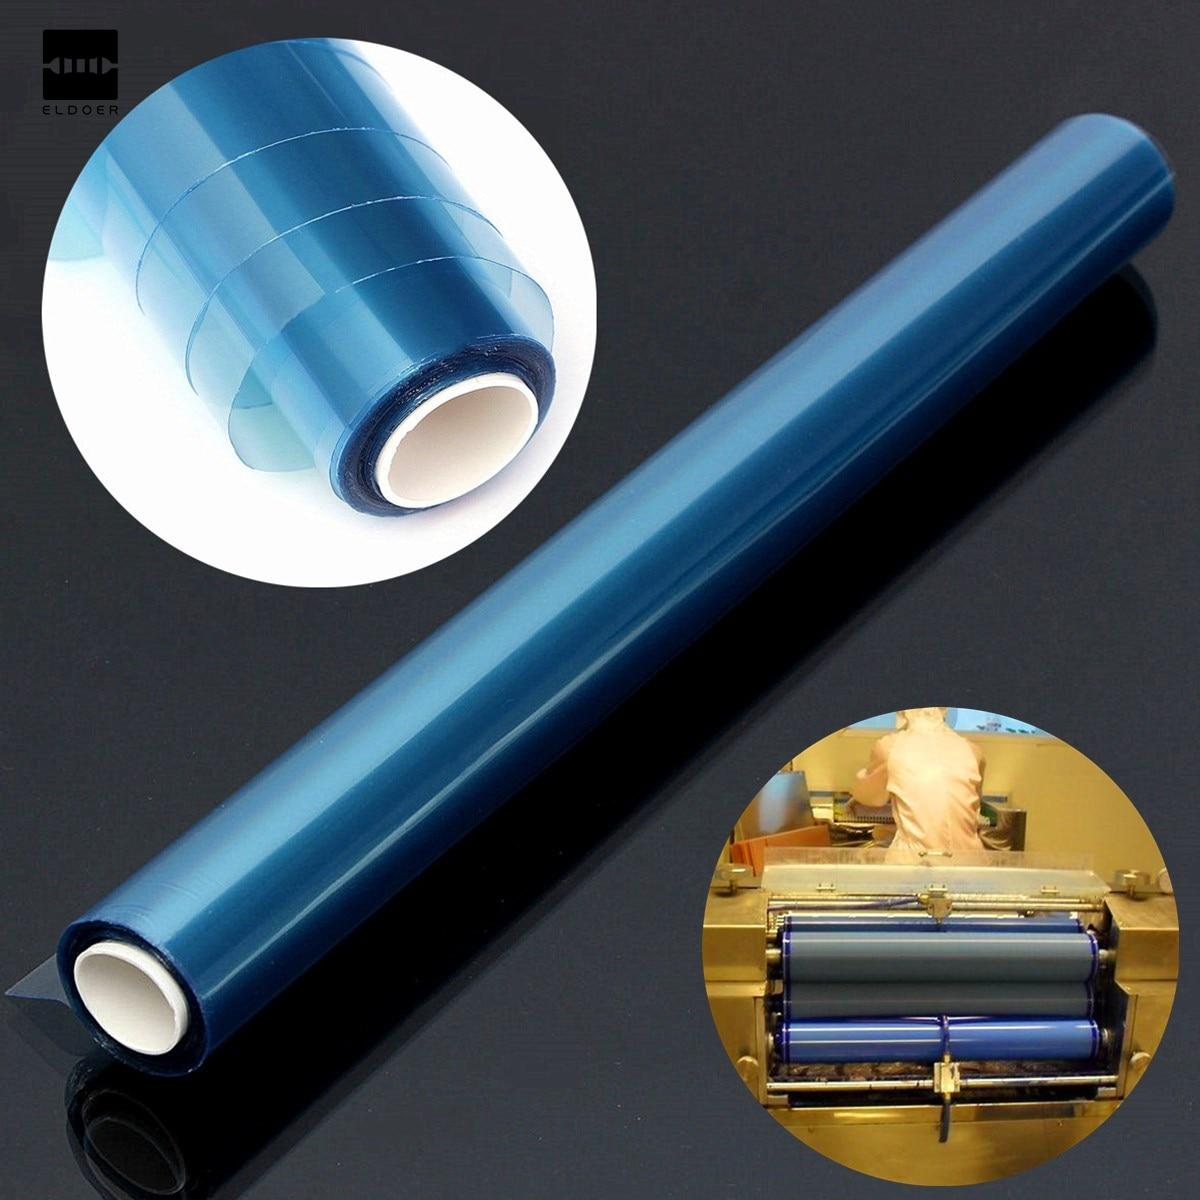 PCB Hot Sale Portable Photosensitive Dry Film For Circuit Production Photoresist Sheets 30cm X 5m Electronic Components